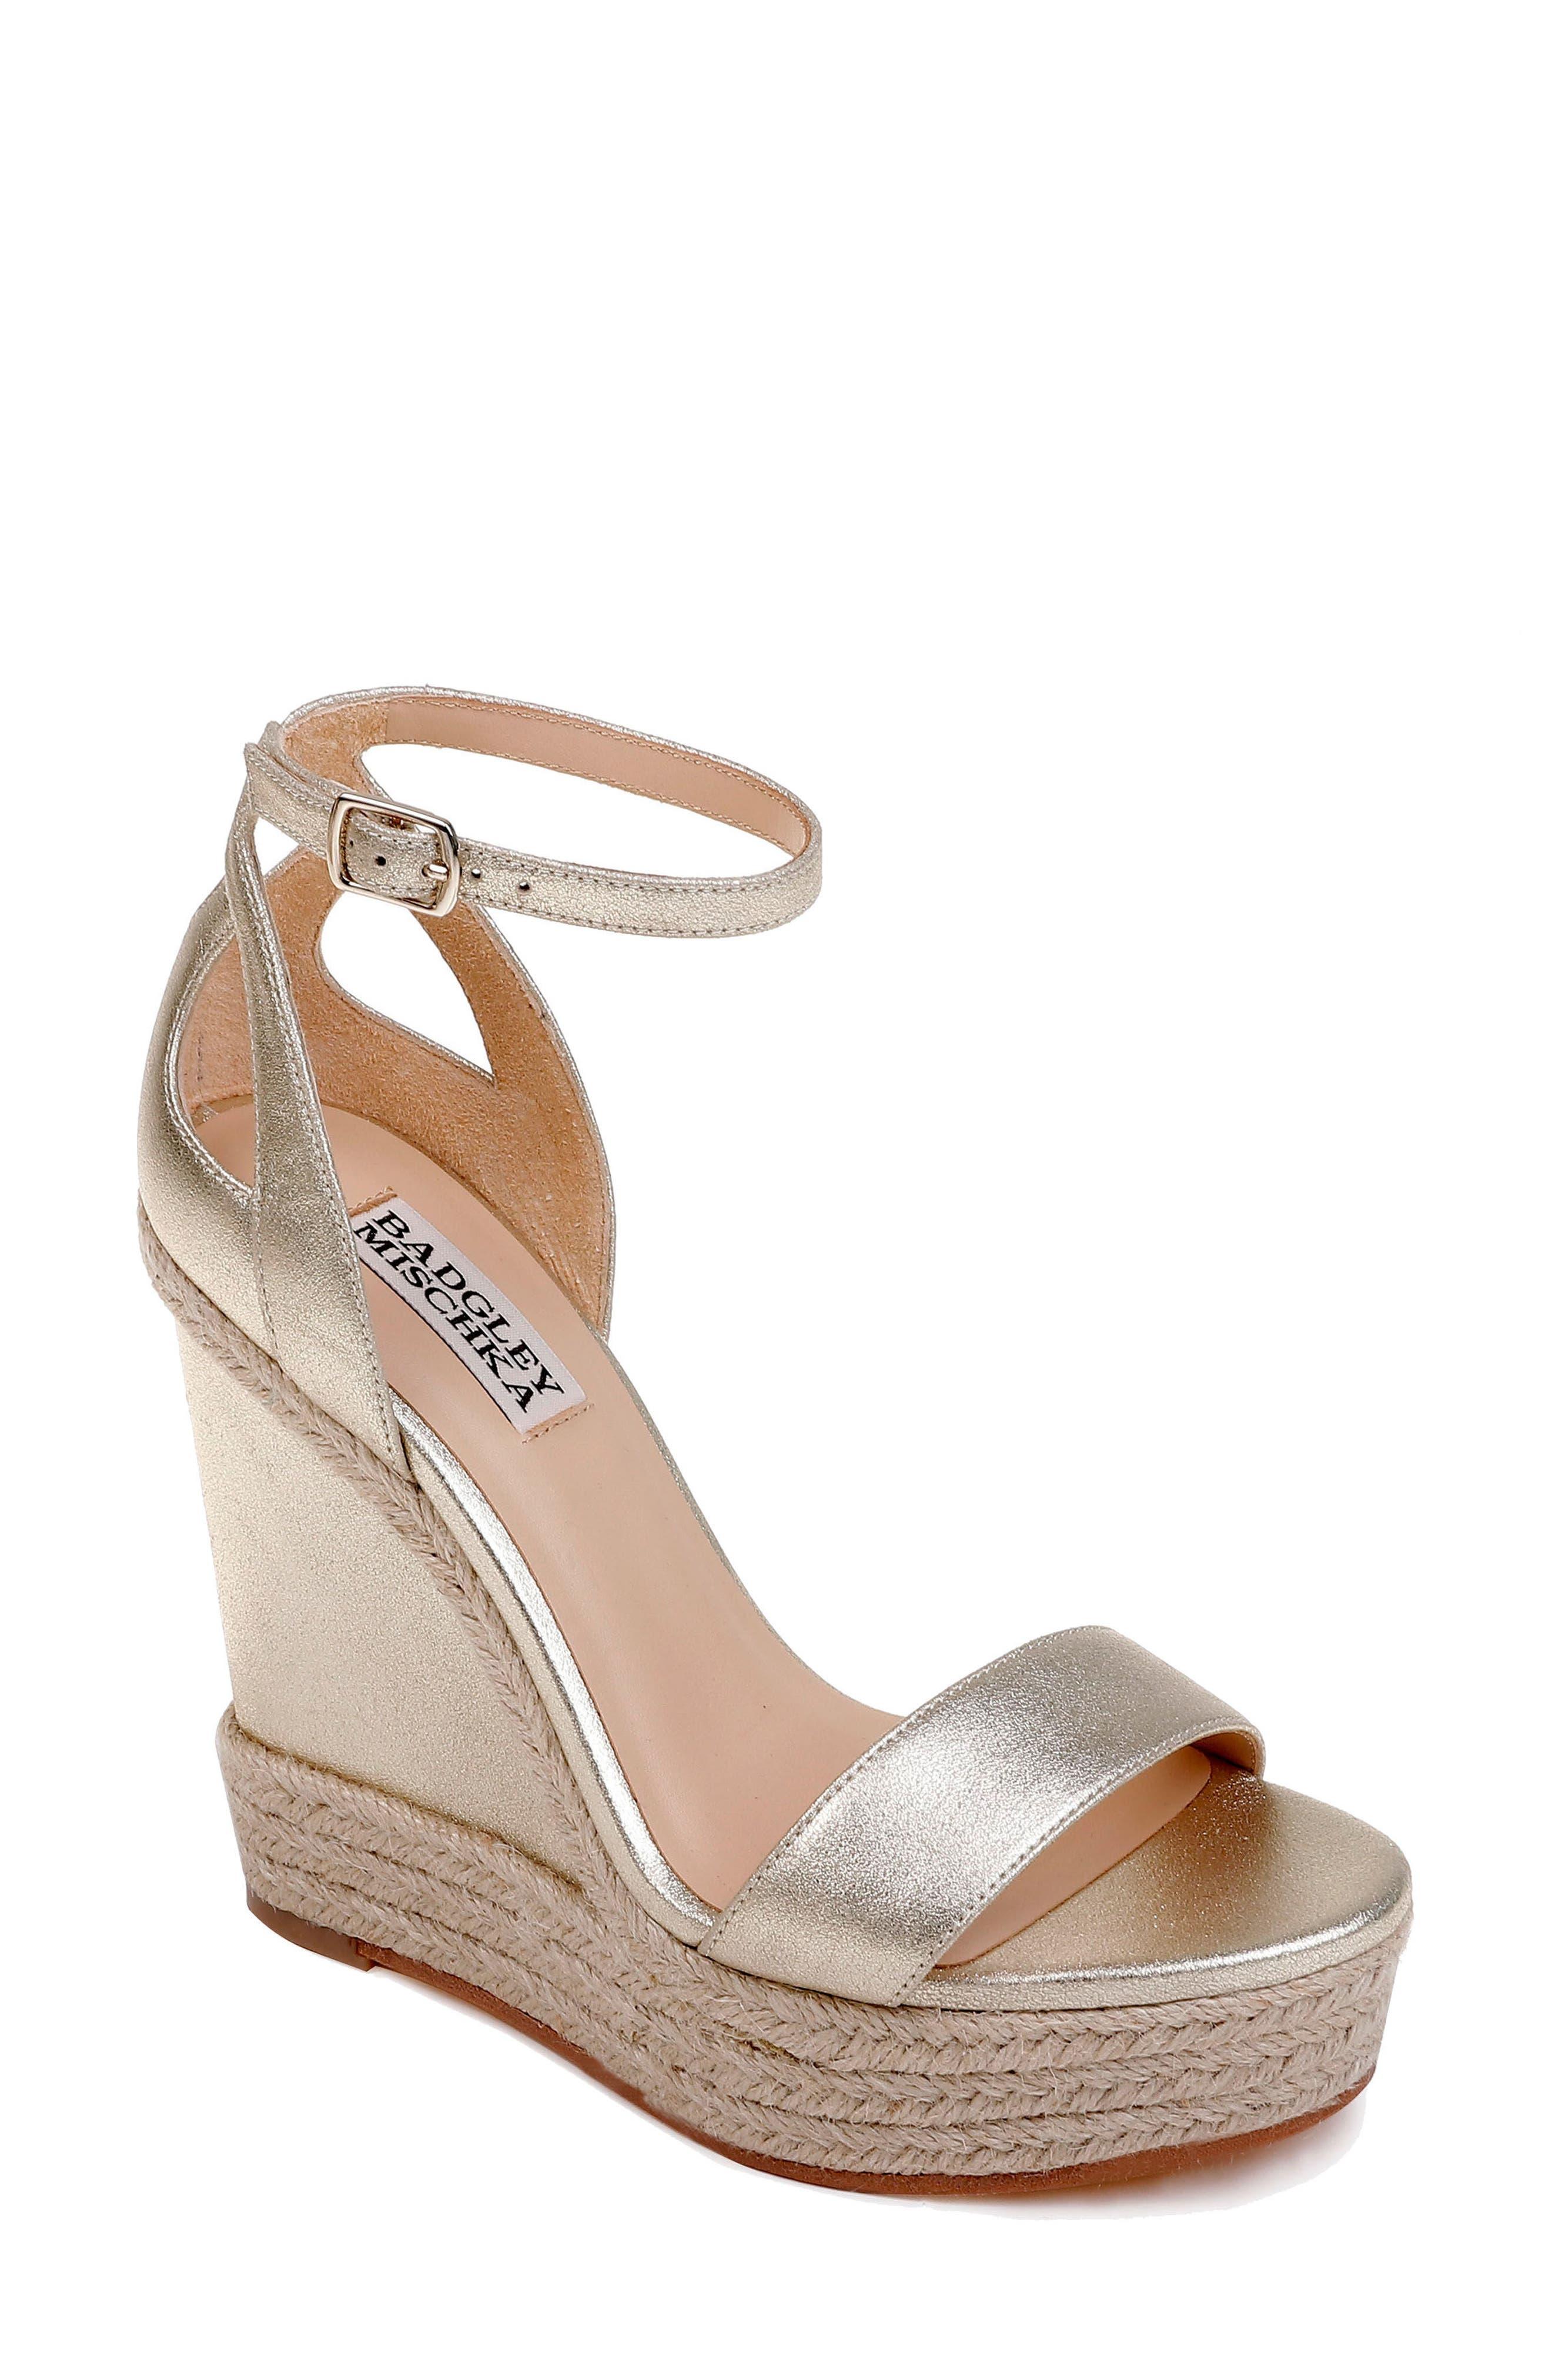 Honest Espadrille Wedge Sandal,                         Main,                         color,